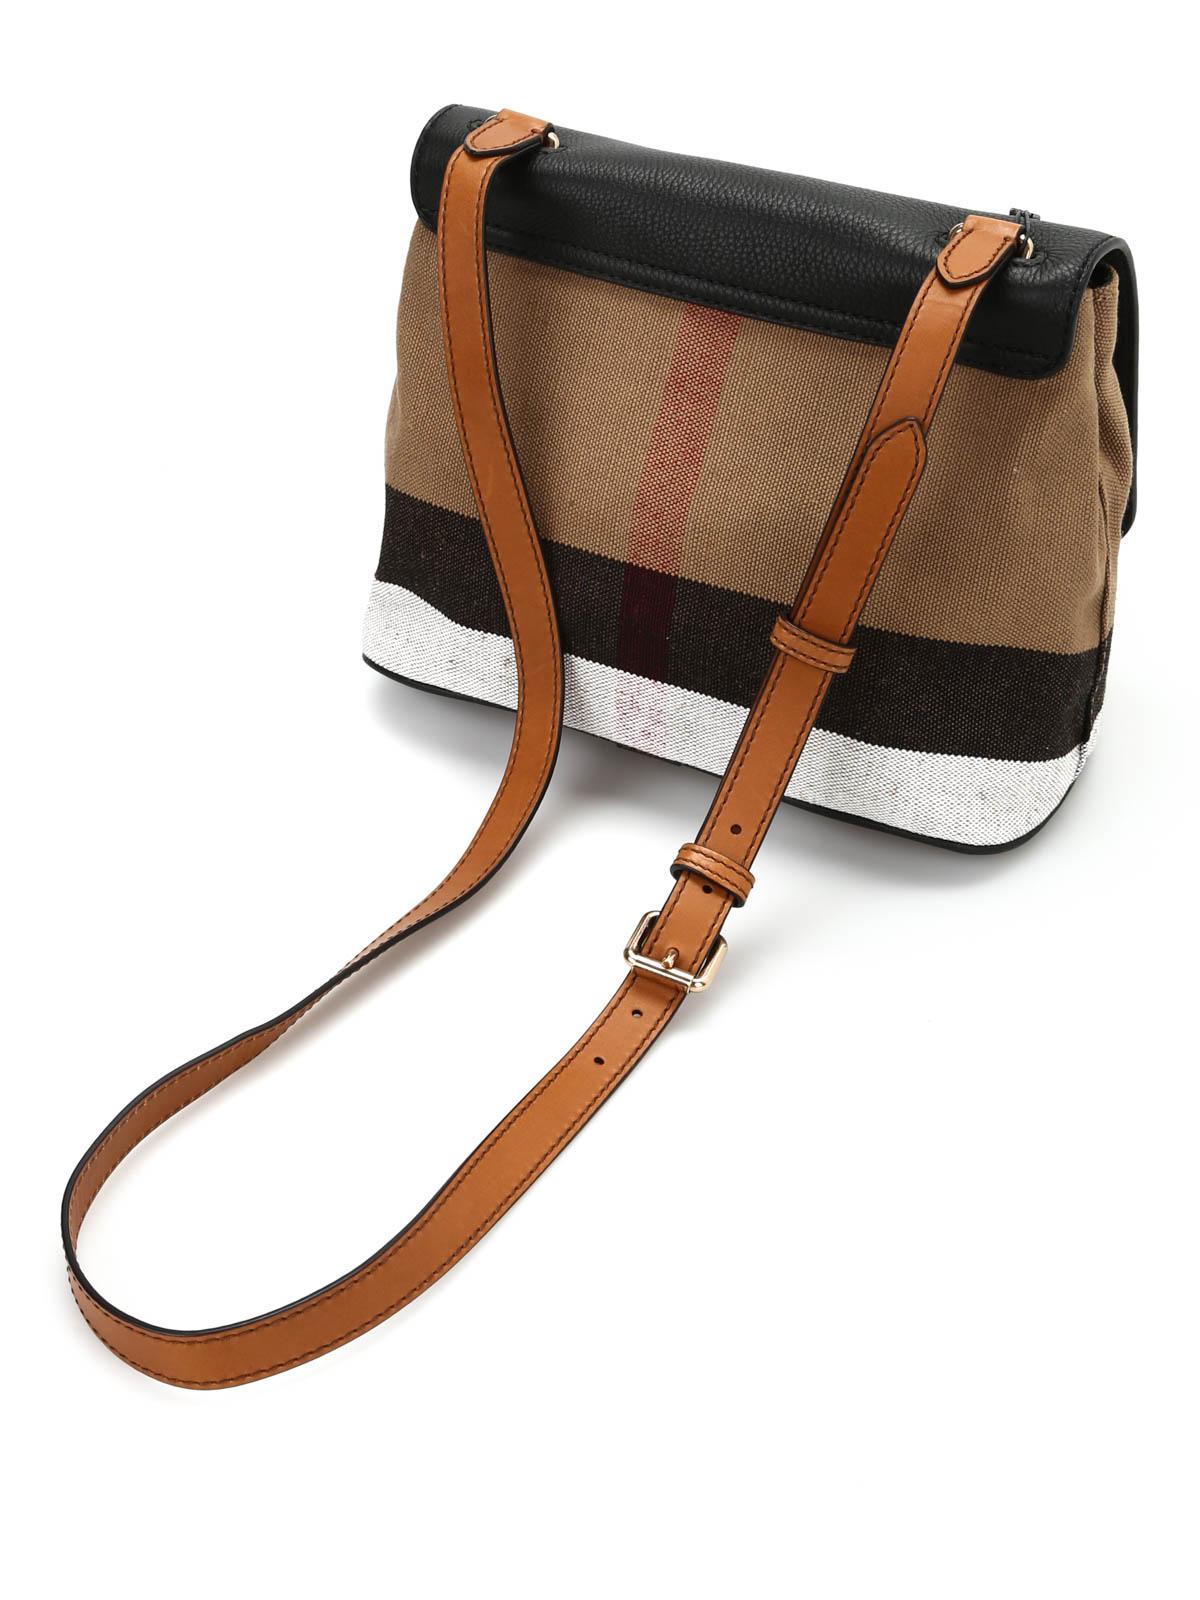 89c54391f1ae Burberry - Shellwood crossbody - cross body bags - 40205101 BLACK